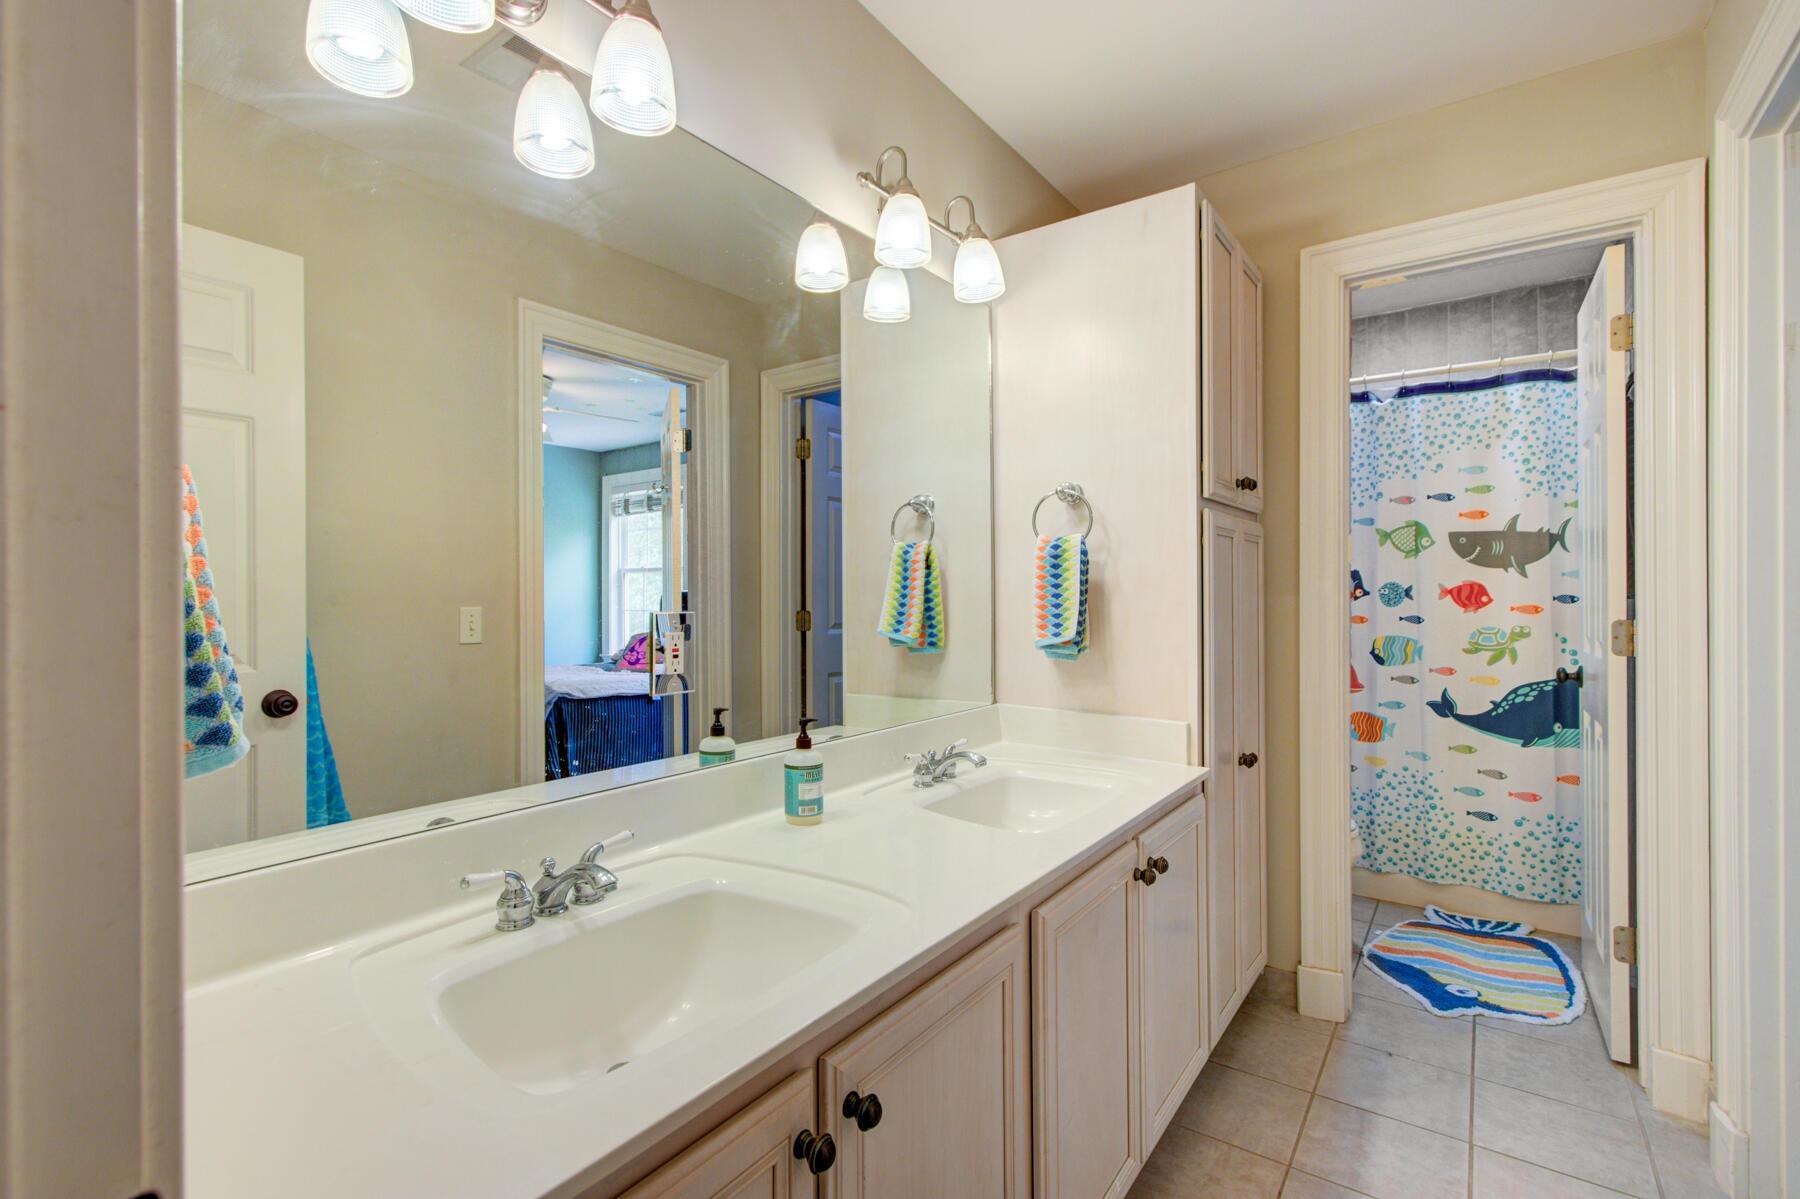 Dunes West Homes For Sale - 3095 Pignatelli, Mount Pleasant, SC - 53